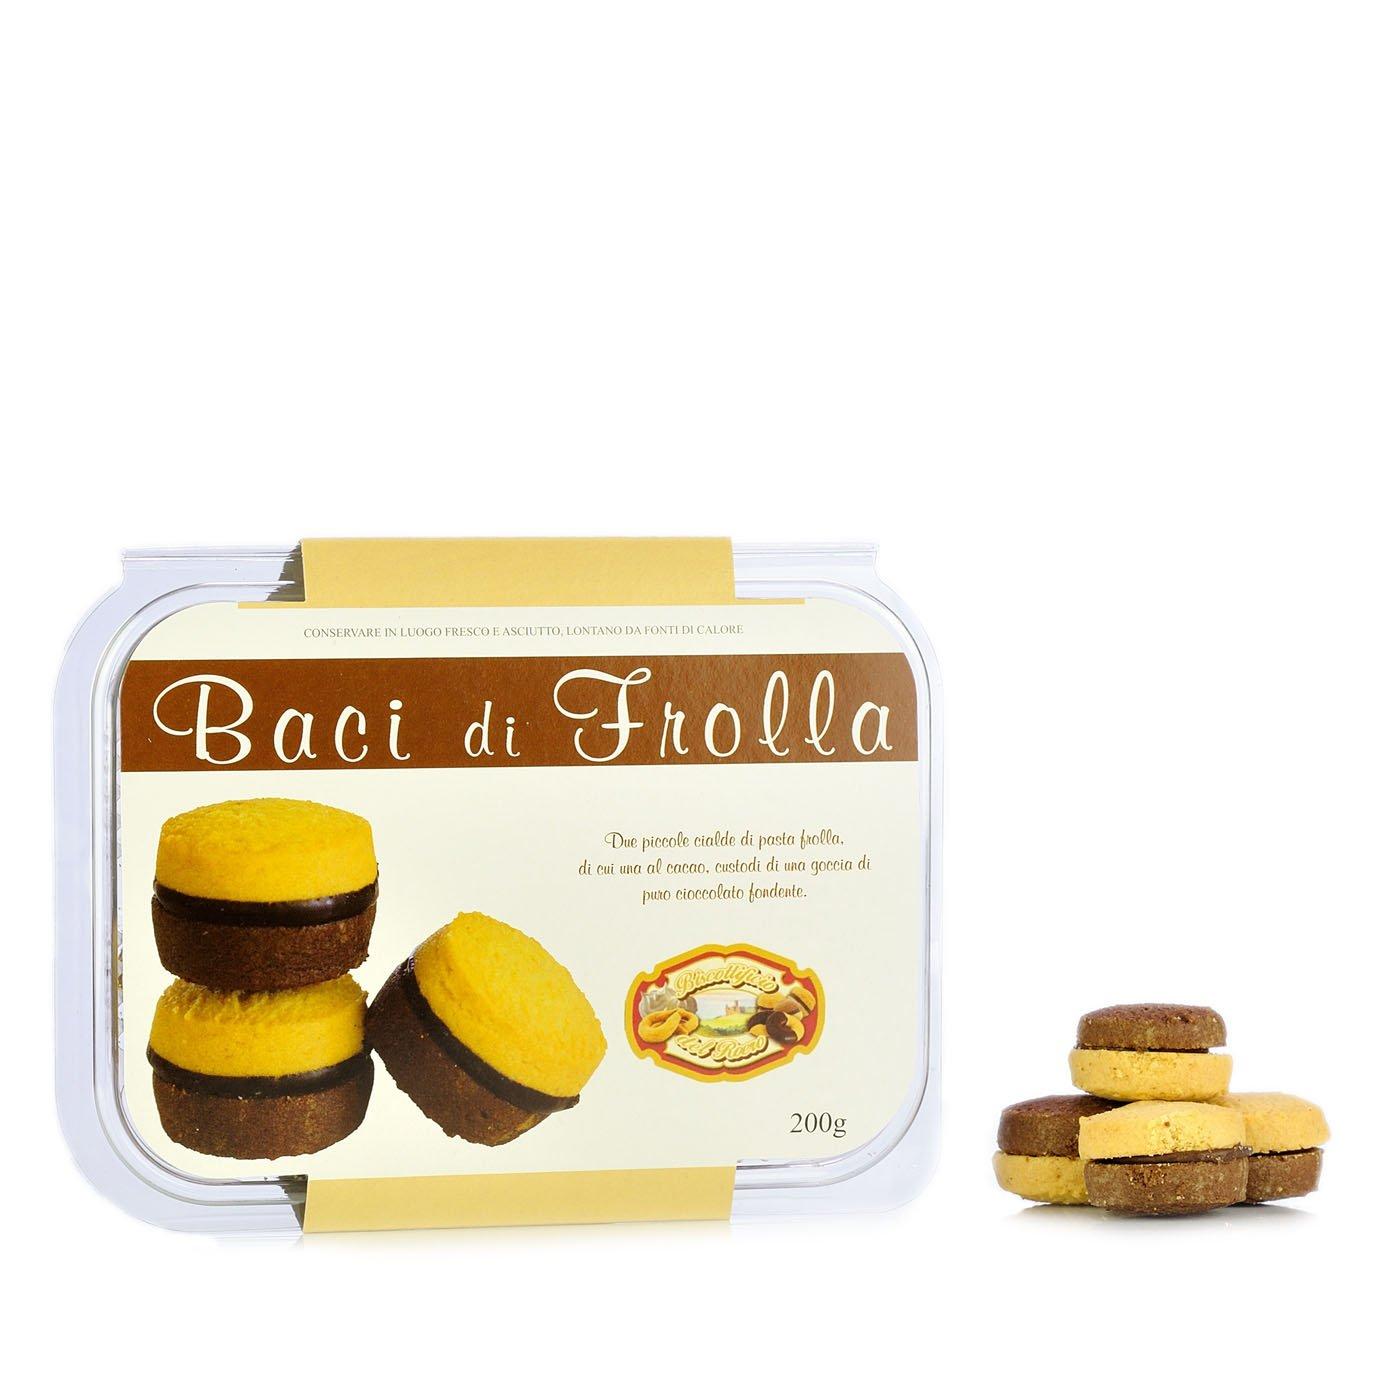 pastry baci di dama by biscottificio roero eataly. Black Bedroom Furniture Sets. Home Design Ideas